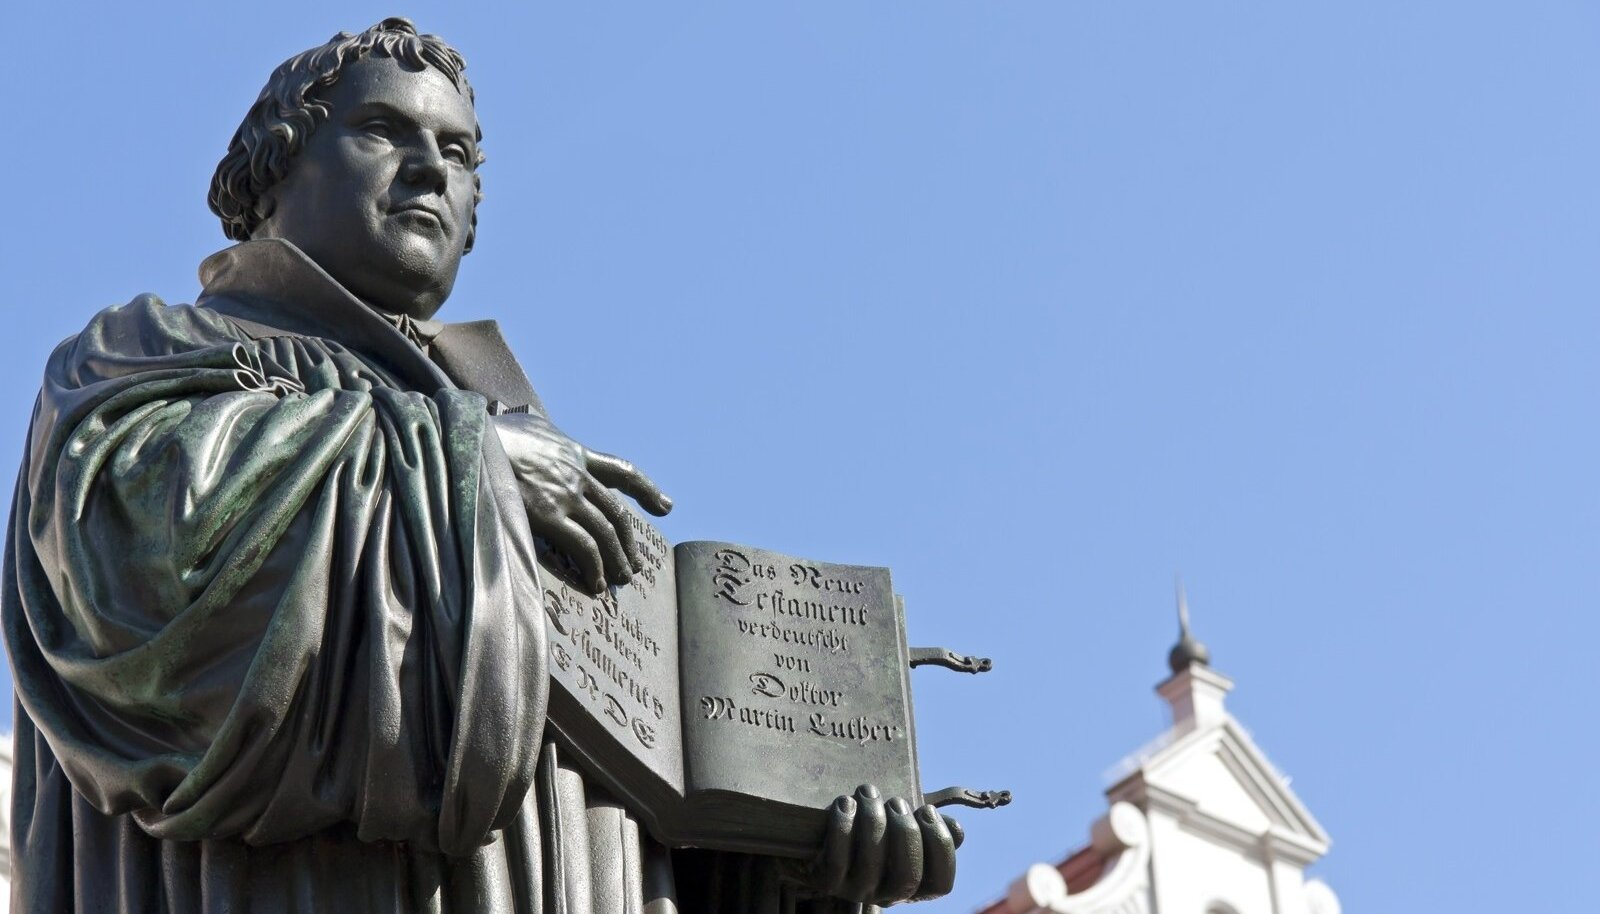 Martin Lutheri monument Wittenbergis